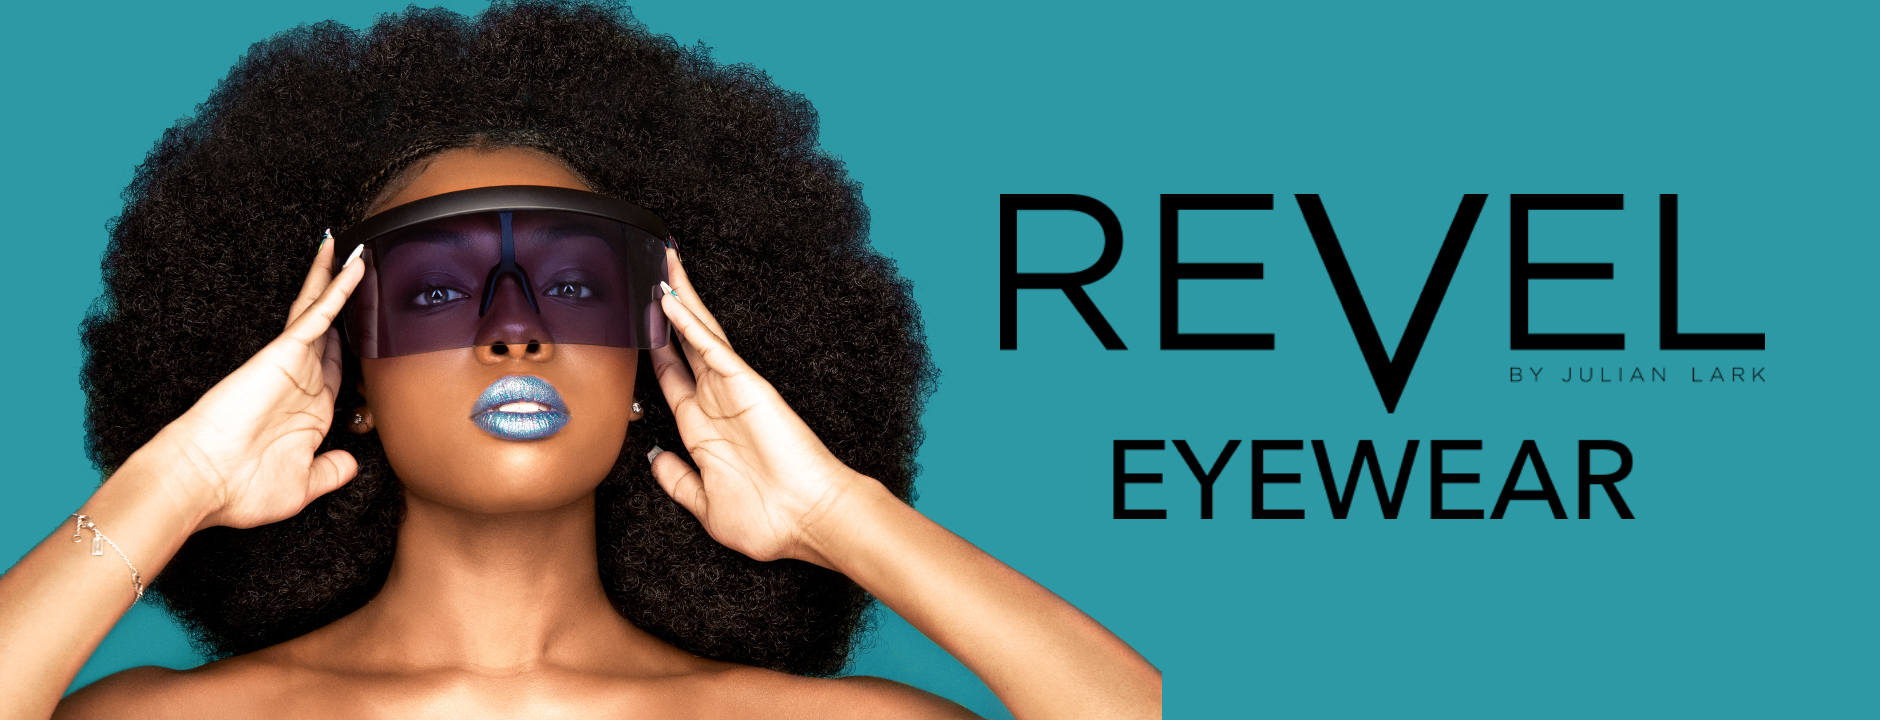 revel eyewear banner